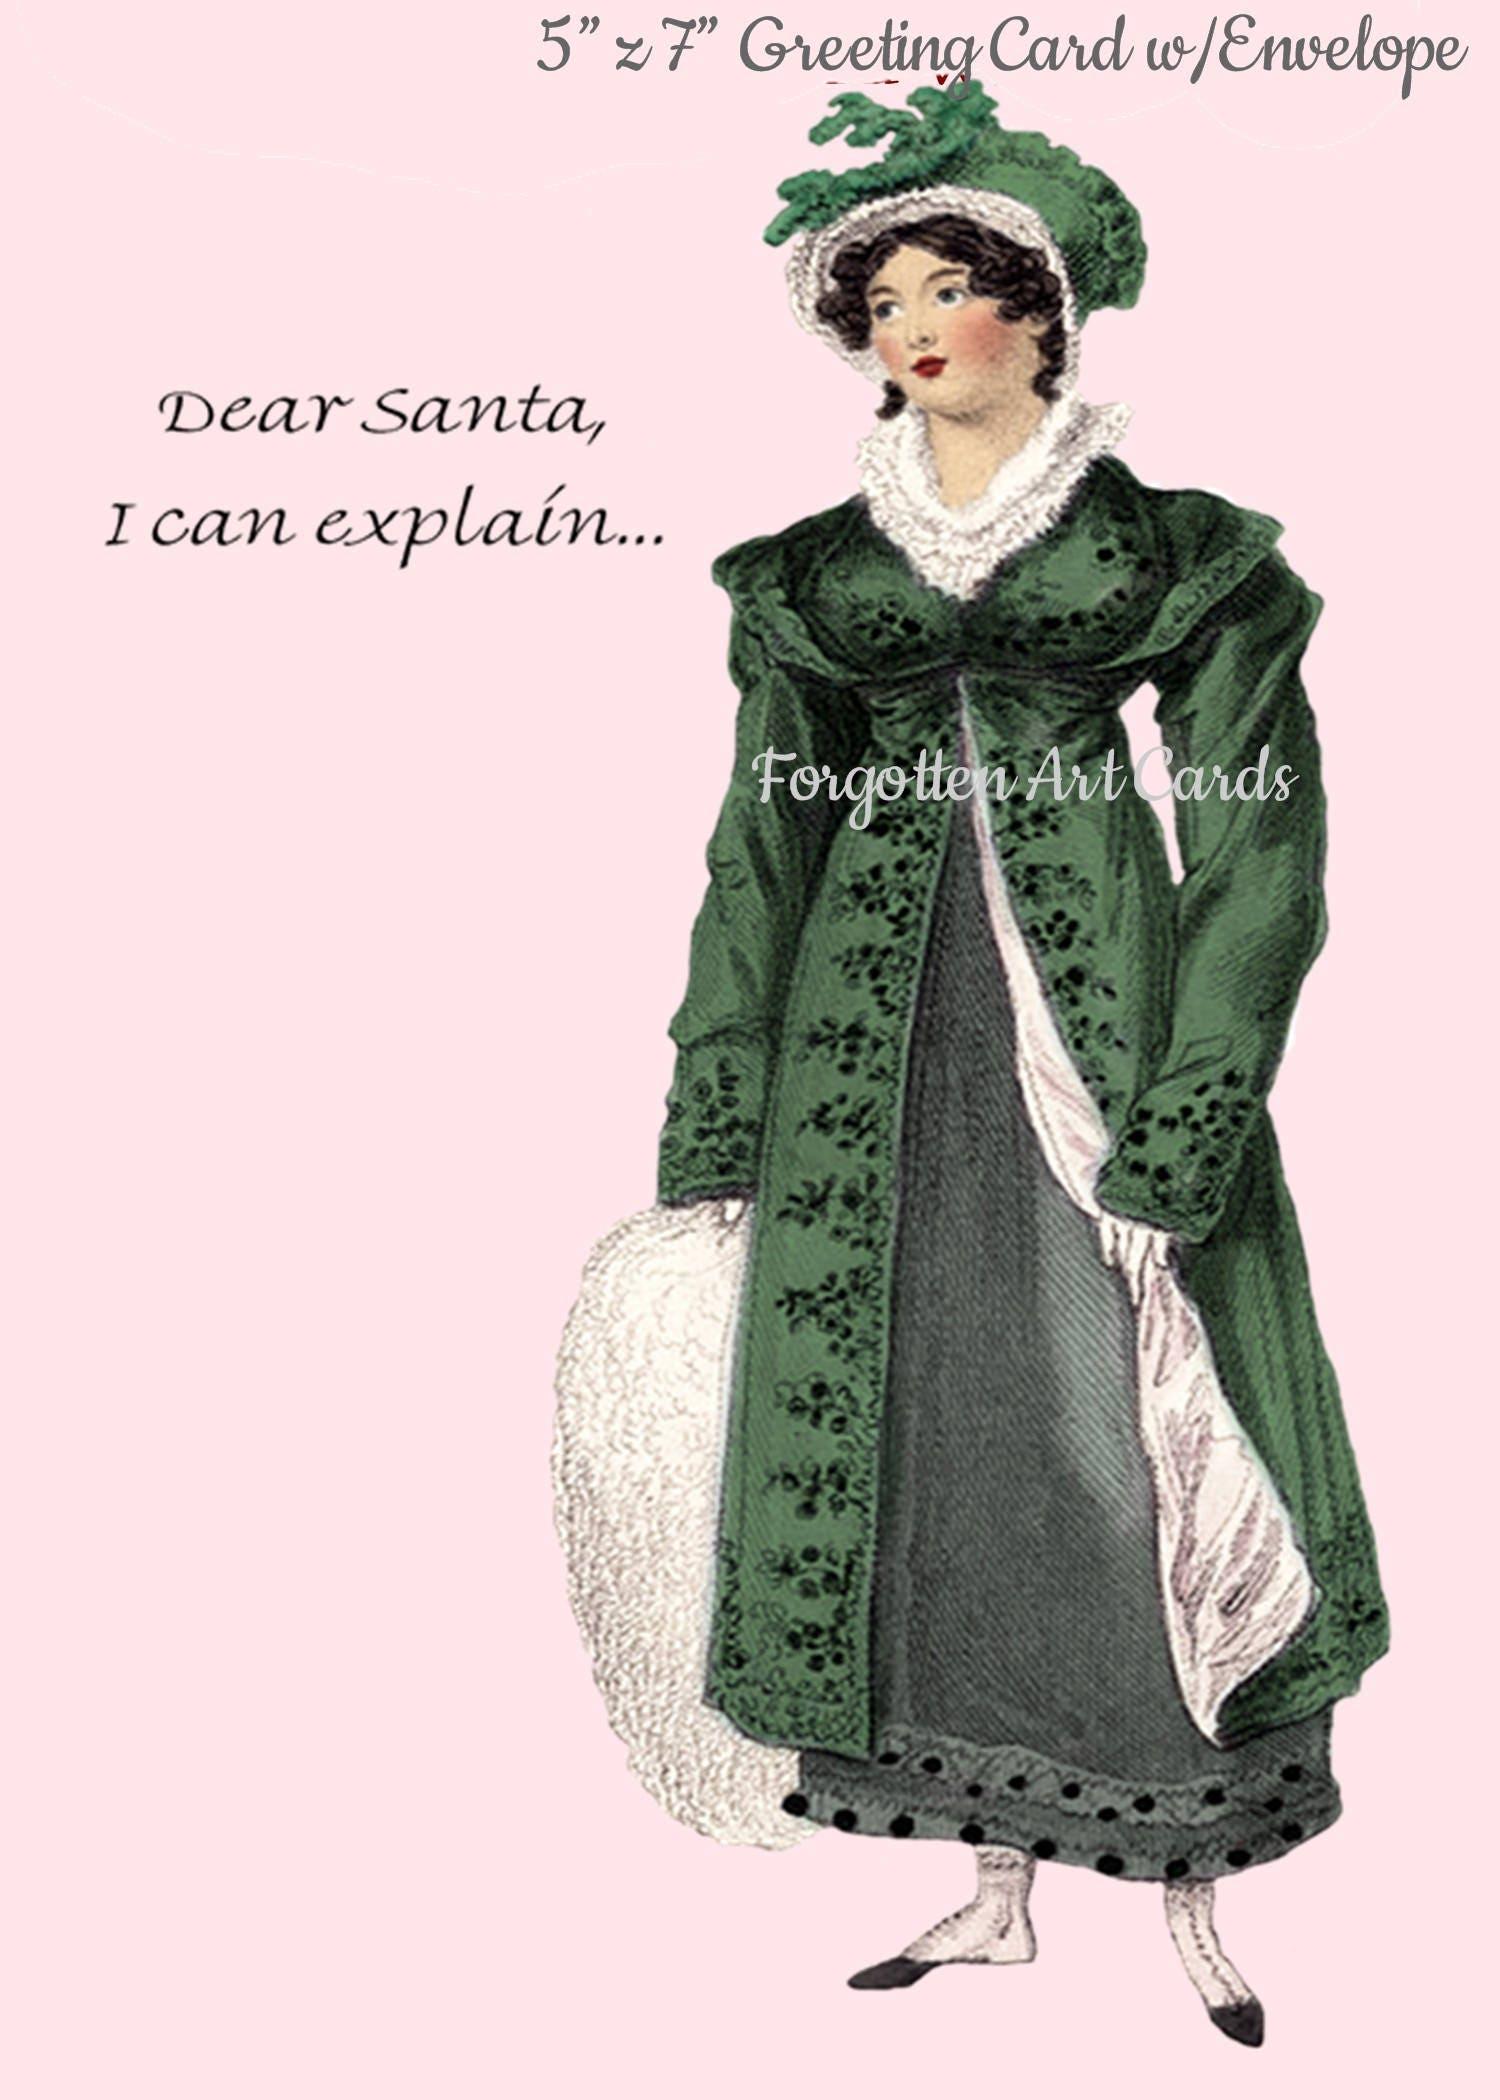 Dear Santa I Can Explain 5 X 7 Greeting Card Wenvelope Jane